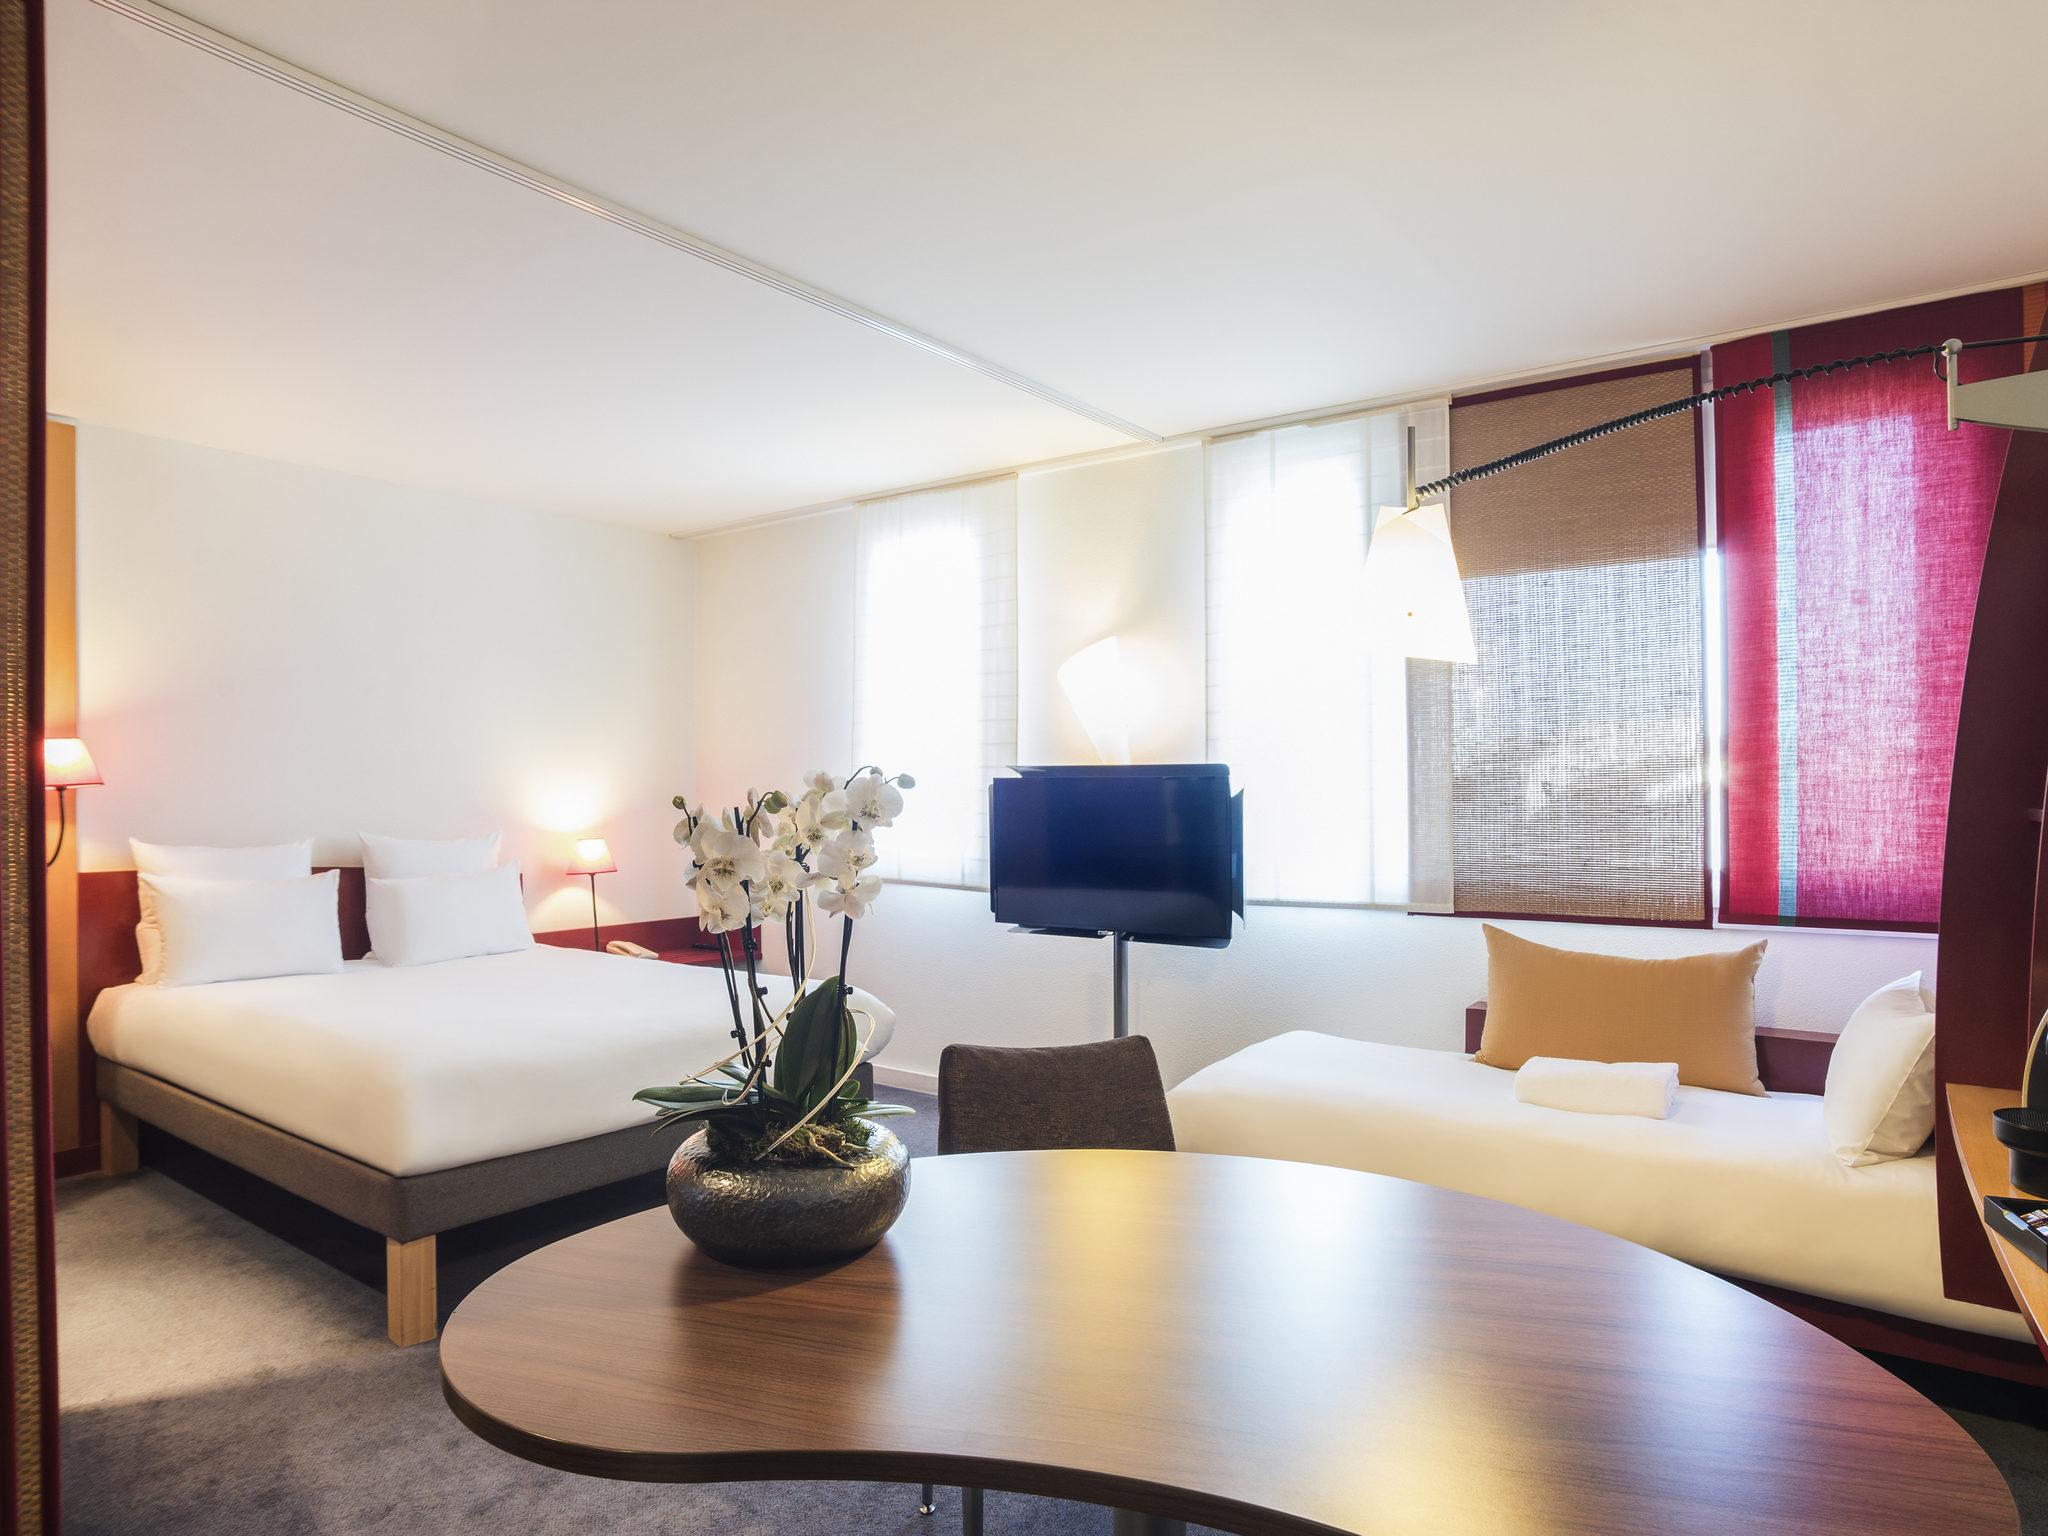 Hotell – Novotel Suites Reims Centre